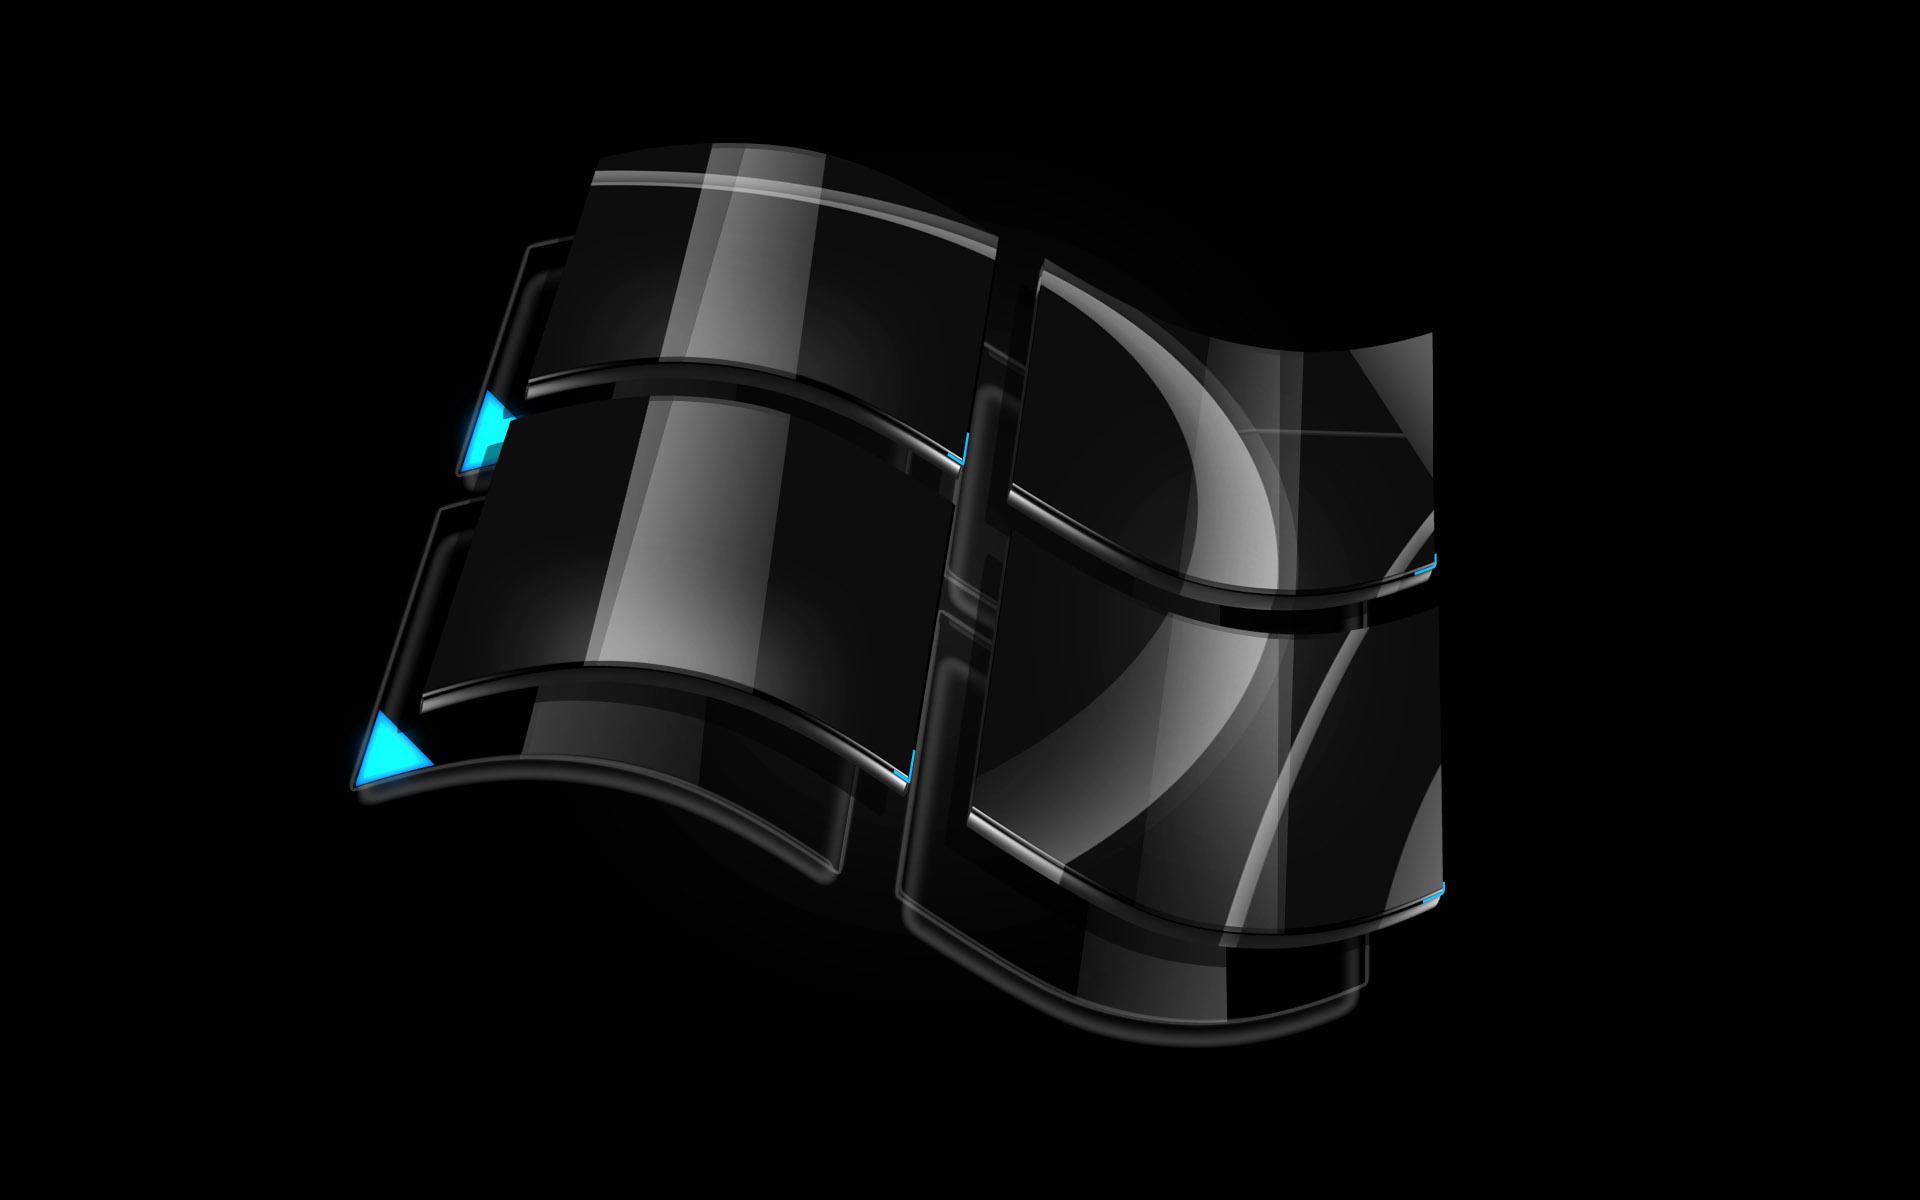 Windows Dark Glass Logo Wallpapers HD Wallpapers 1920x1200